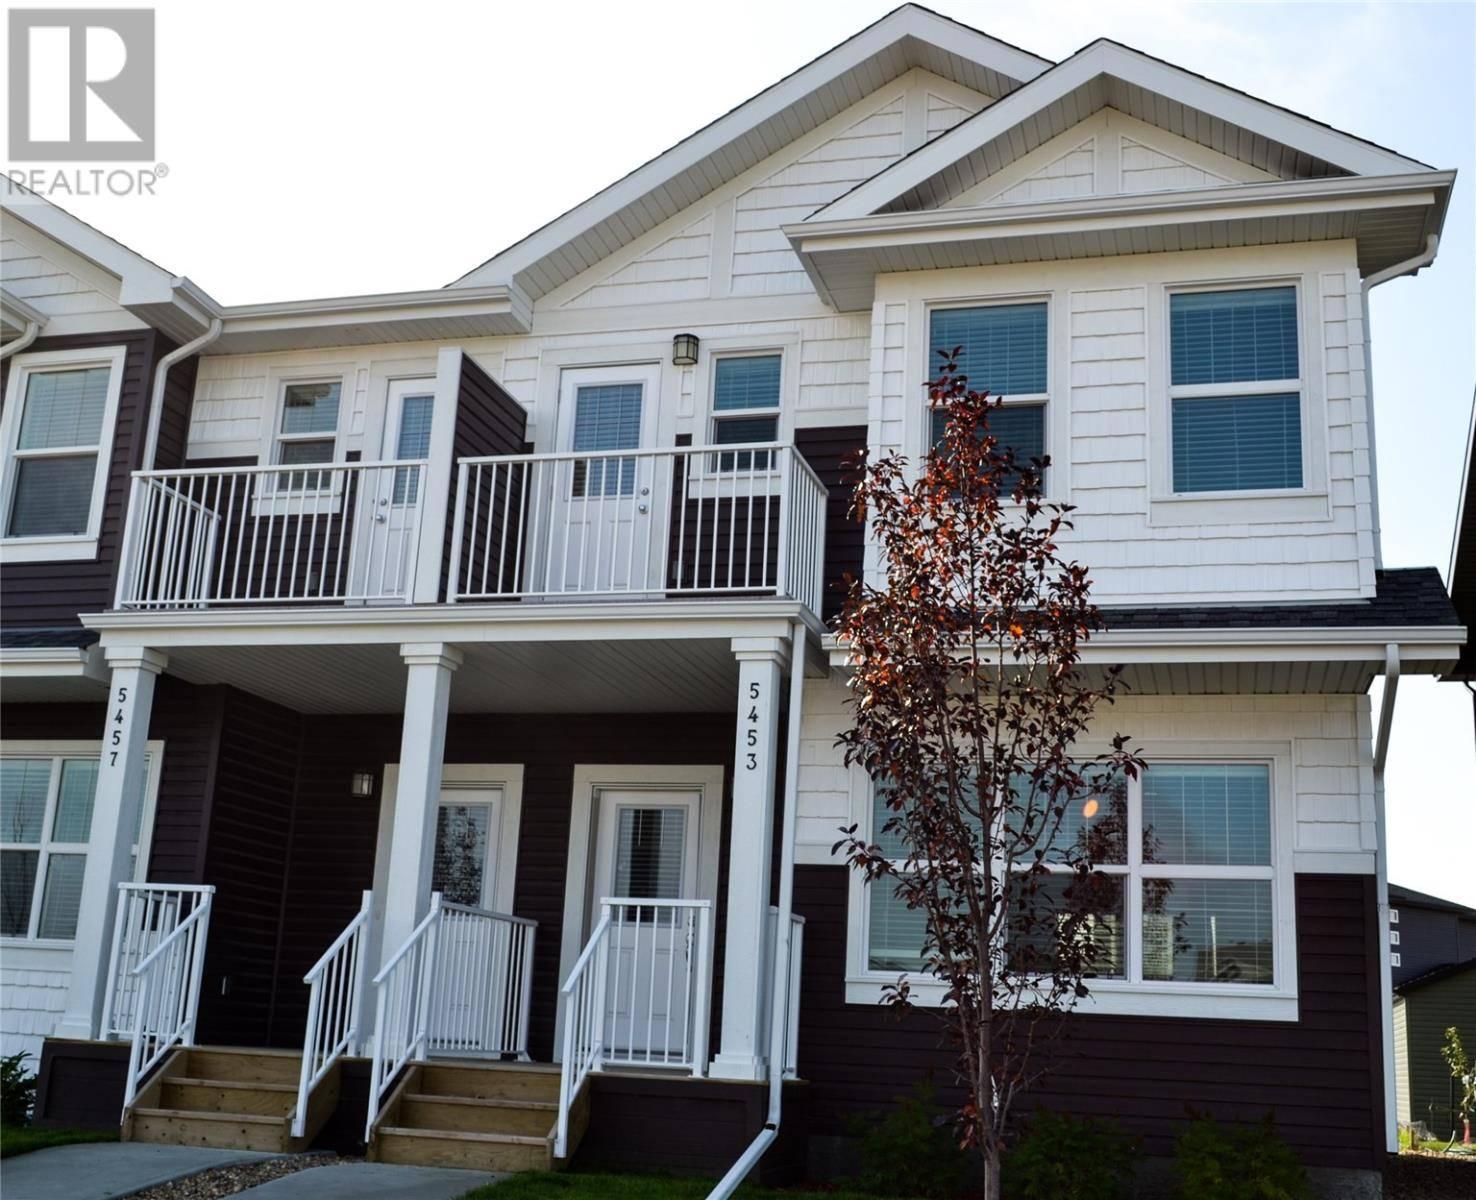 Townhouse for sale at 5453 Cade St E Regina Saskatchewan - MLS: SK763733